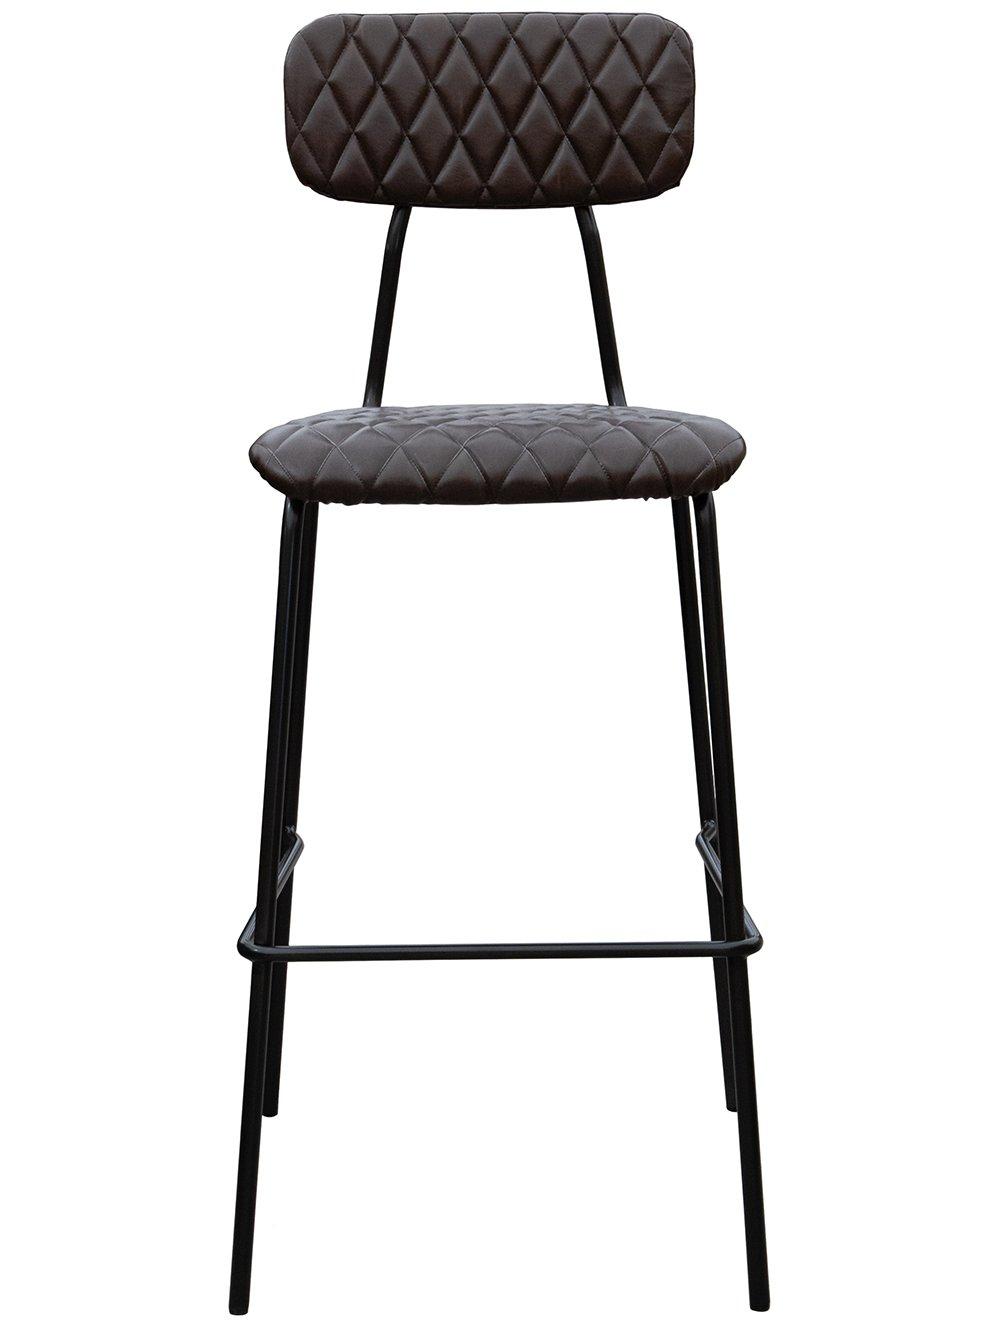 Kara high stool